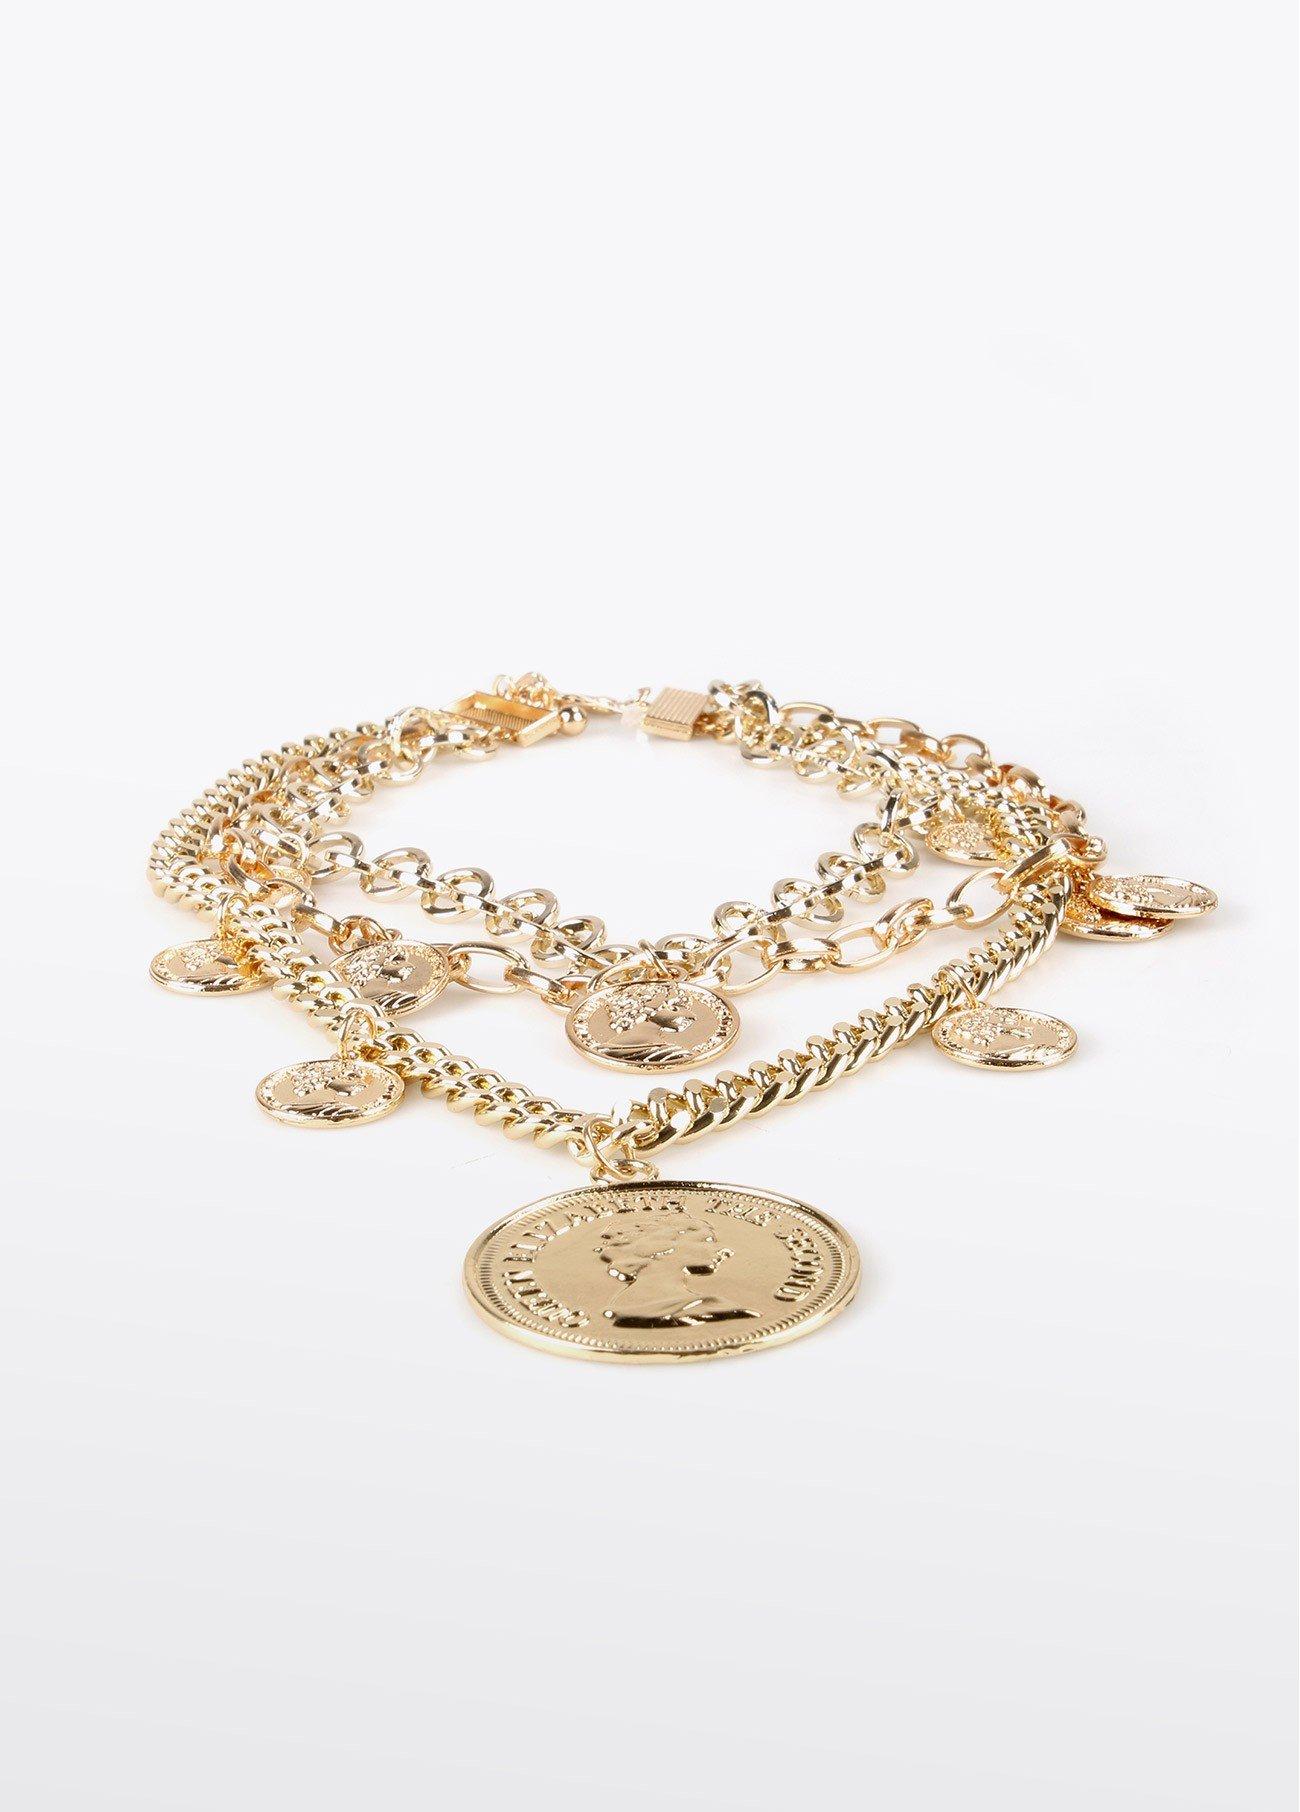 Collar multi cadenas colgante moneda, dorado 2